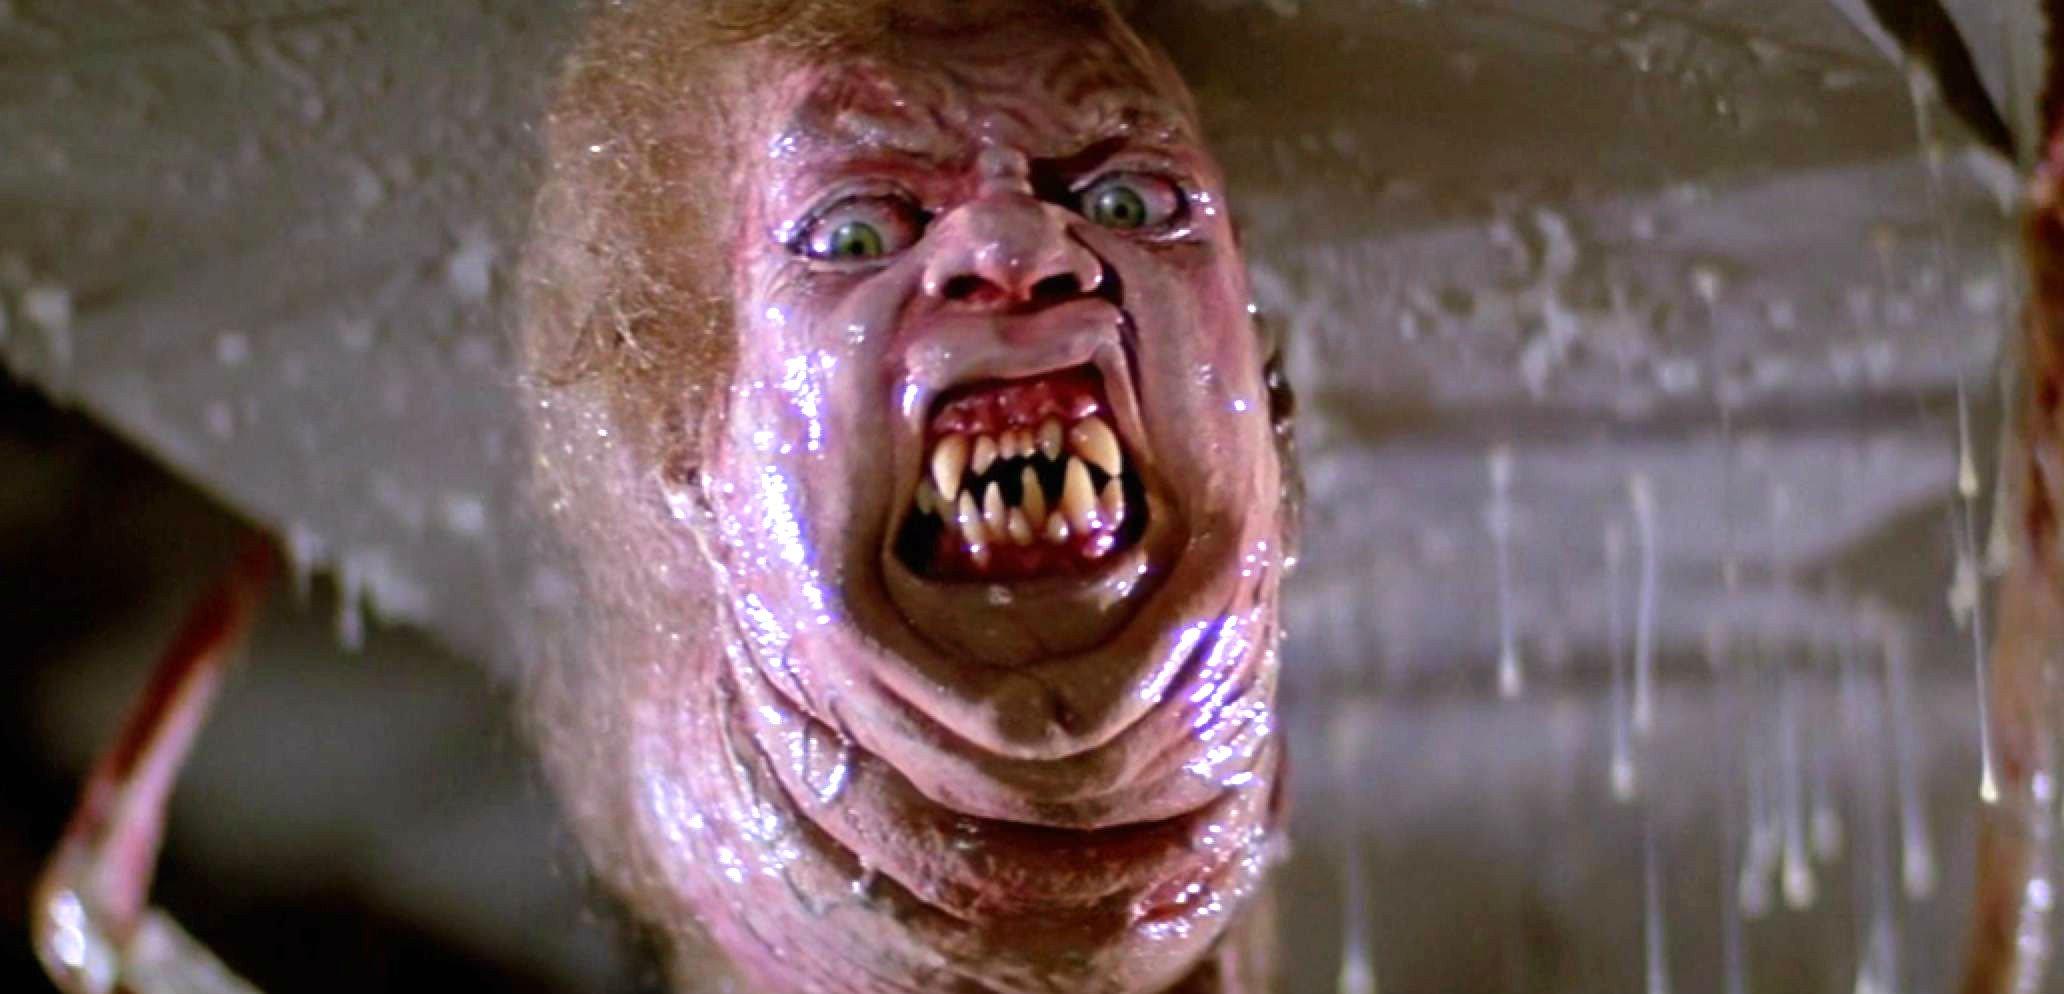 Midget Alien Horrorfilme